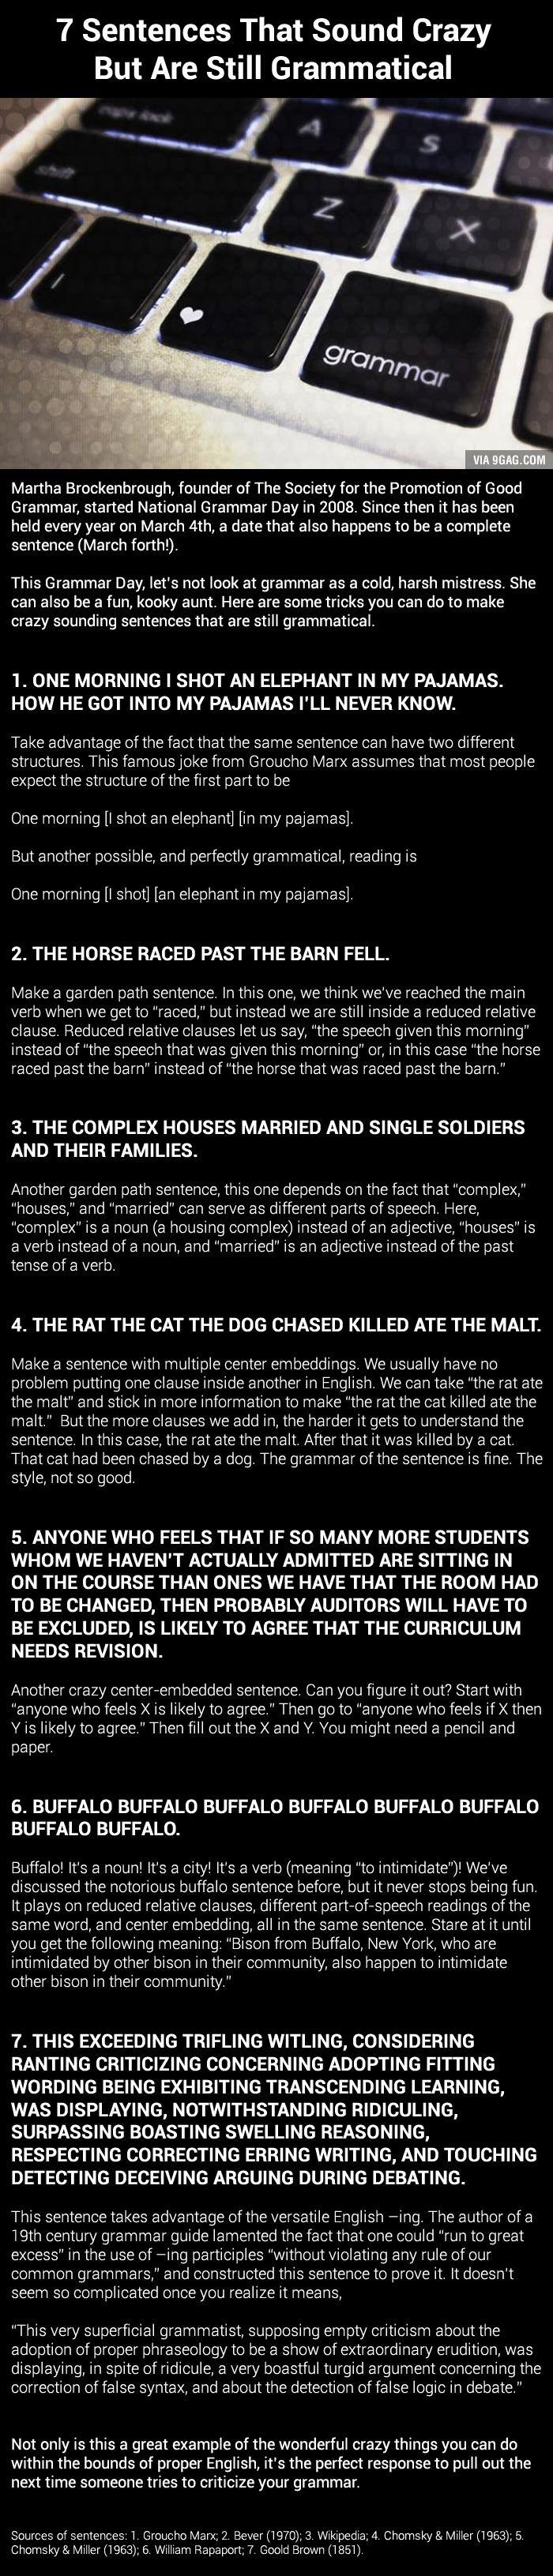 A Gift For Grammar Nazis: 7 Sentences That Sound Crazy But Are Still Grammatical  (National Grammar Day)